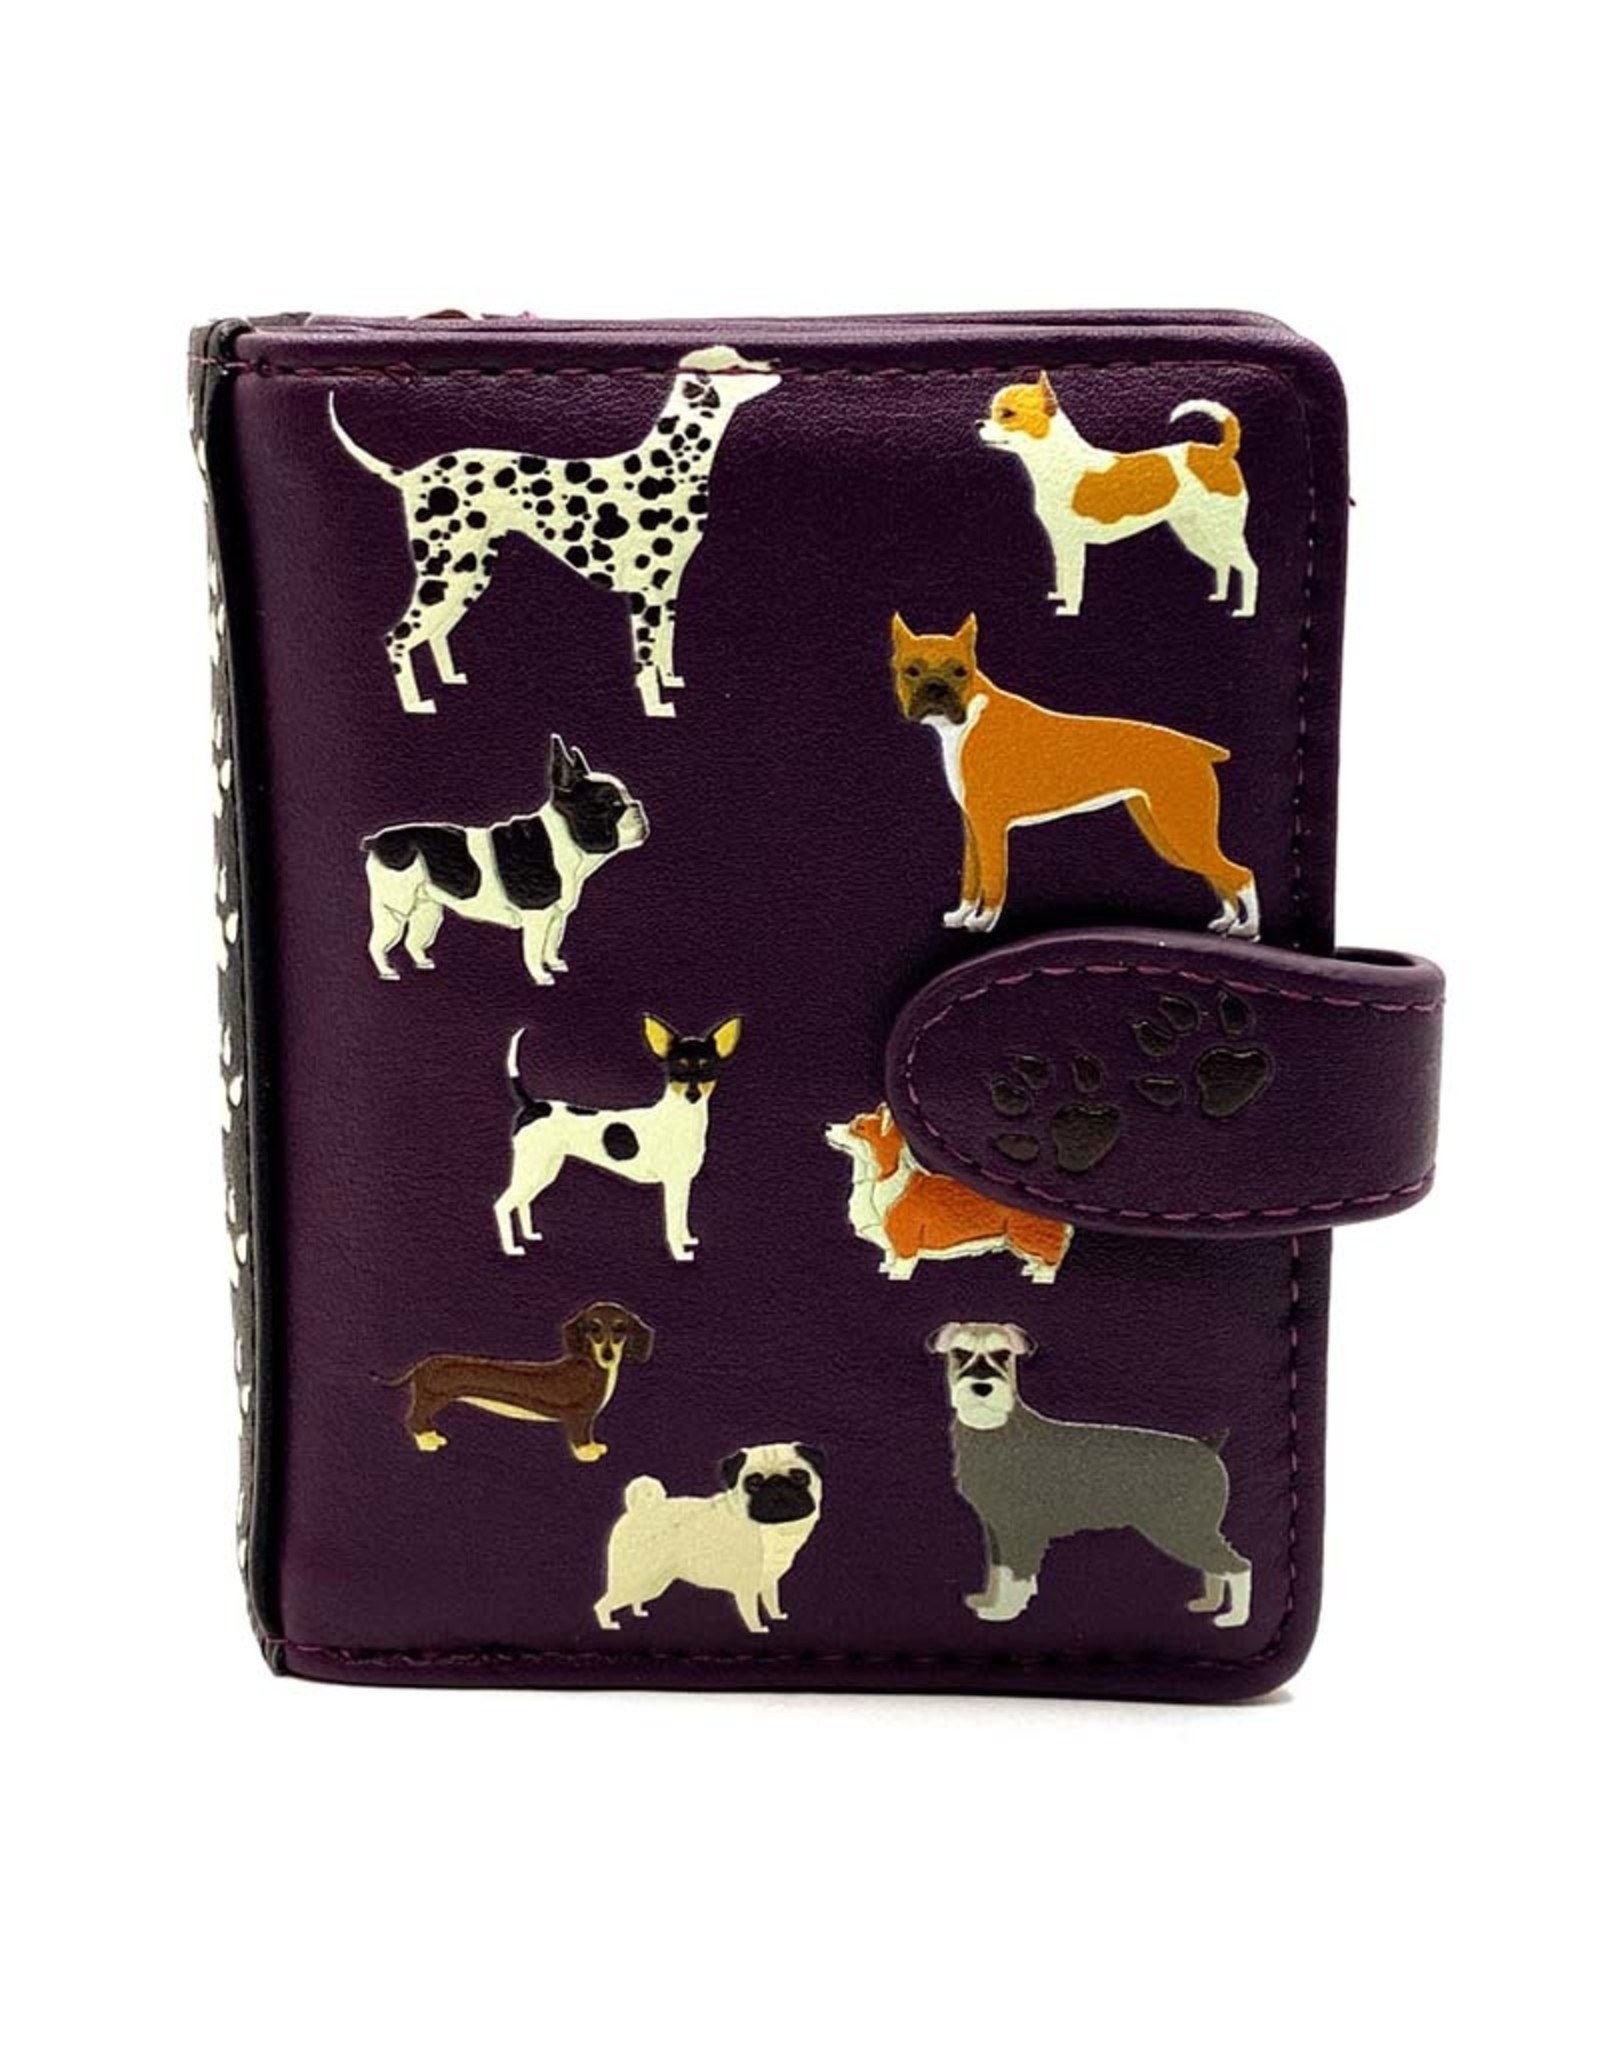 SHAGWEAR DOGS DOGS DOGS SMALL WALLET